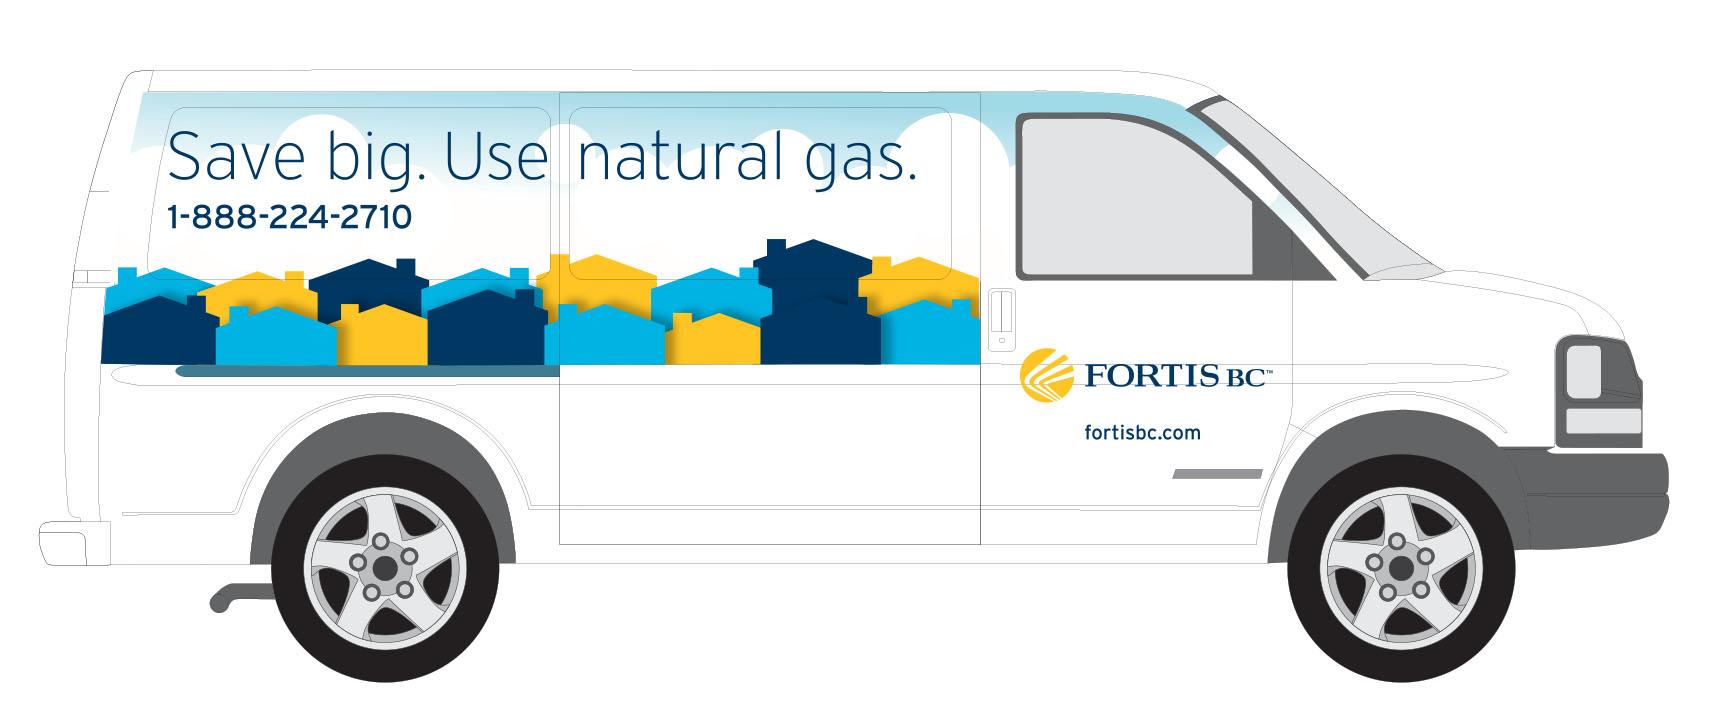 Natural gas conversion campaign -